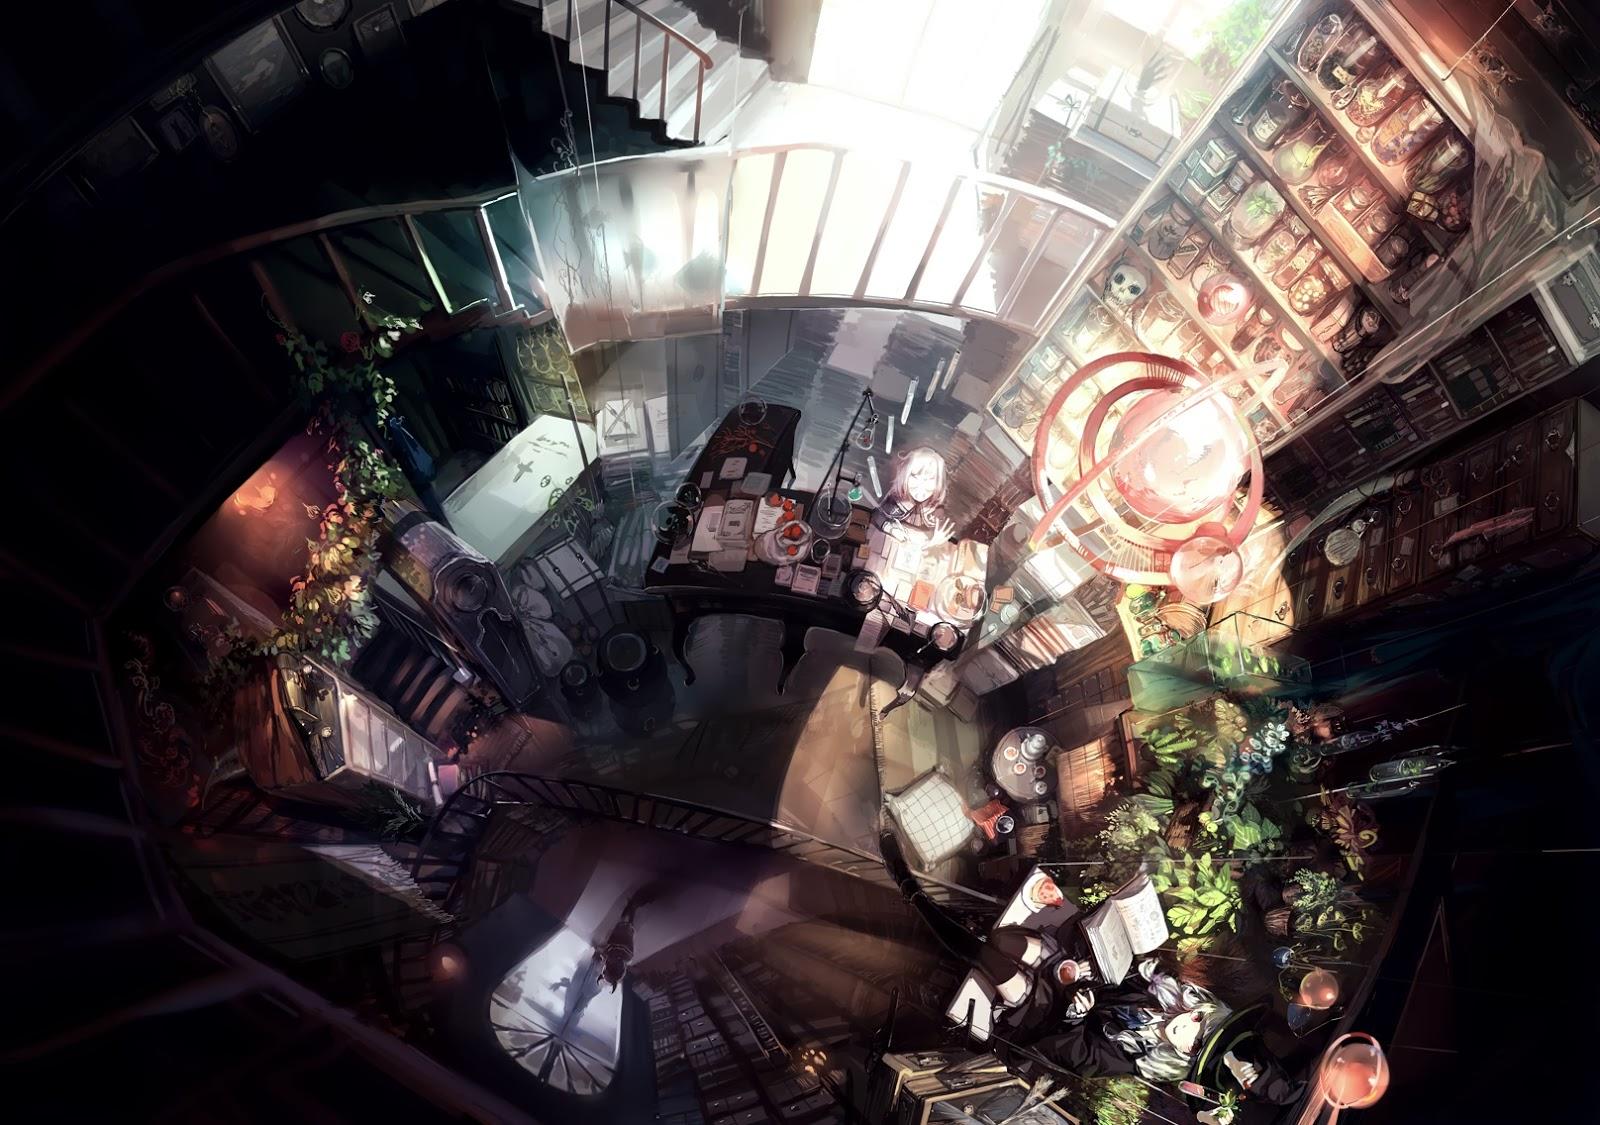 Anime Wallpaperanime Librarycool Wallpaper Dark Creepy Library Scenery